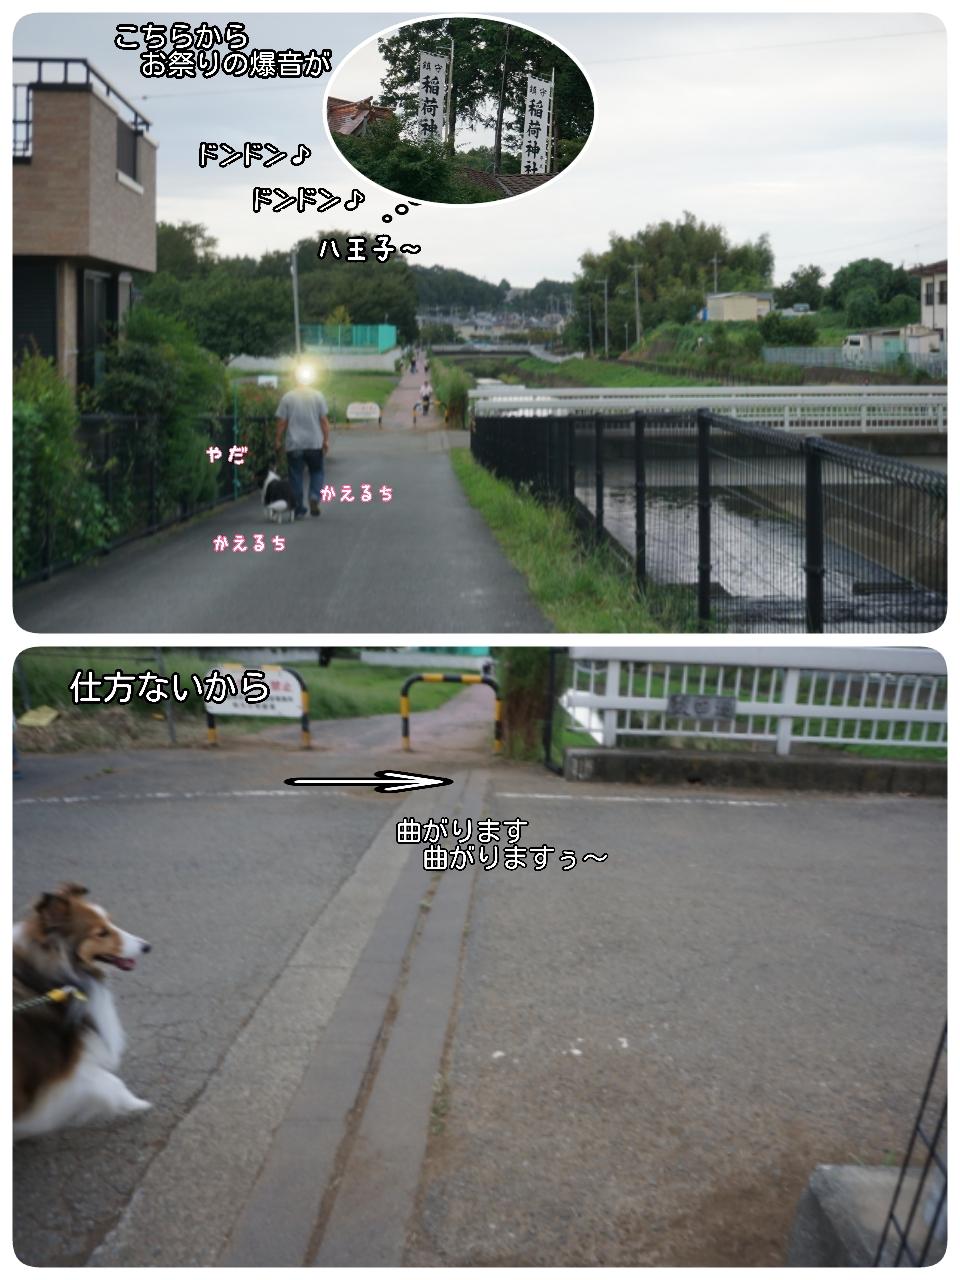 16-09-03-22-28-05-521_deco.jpg